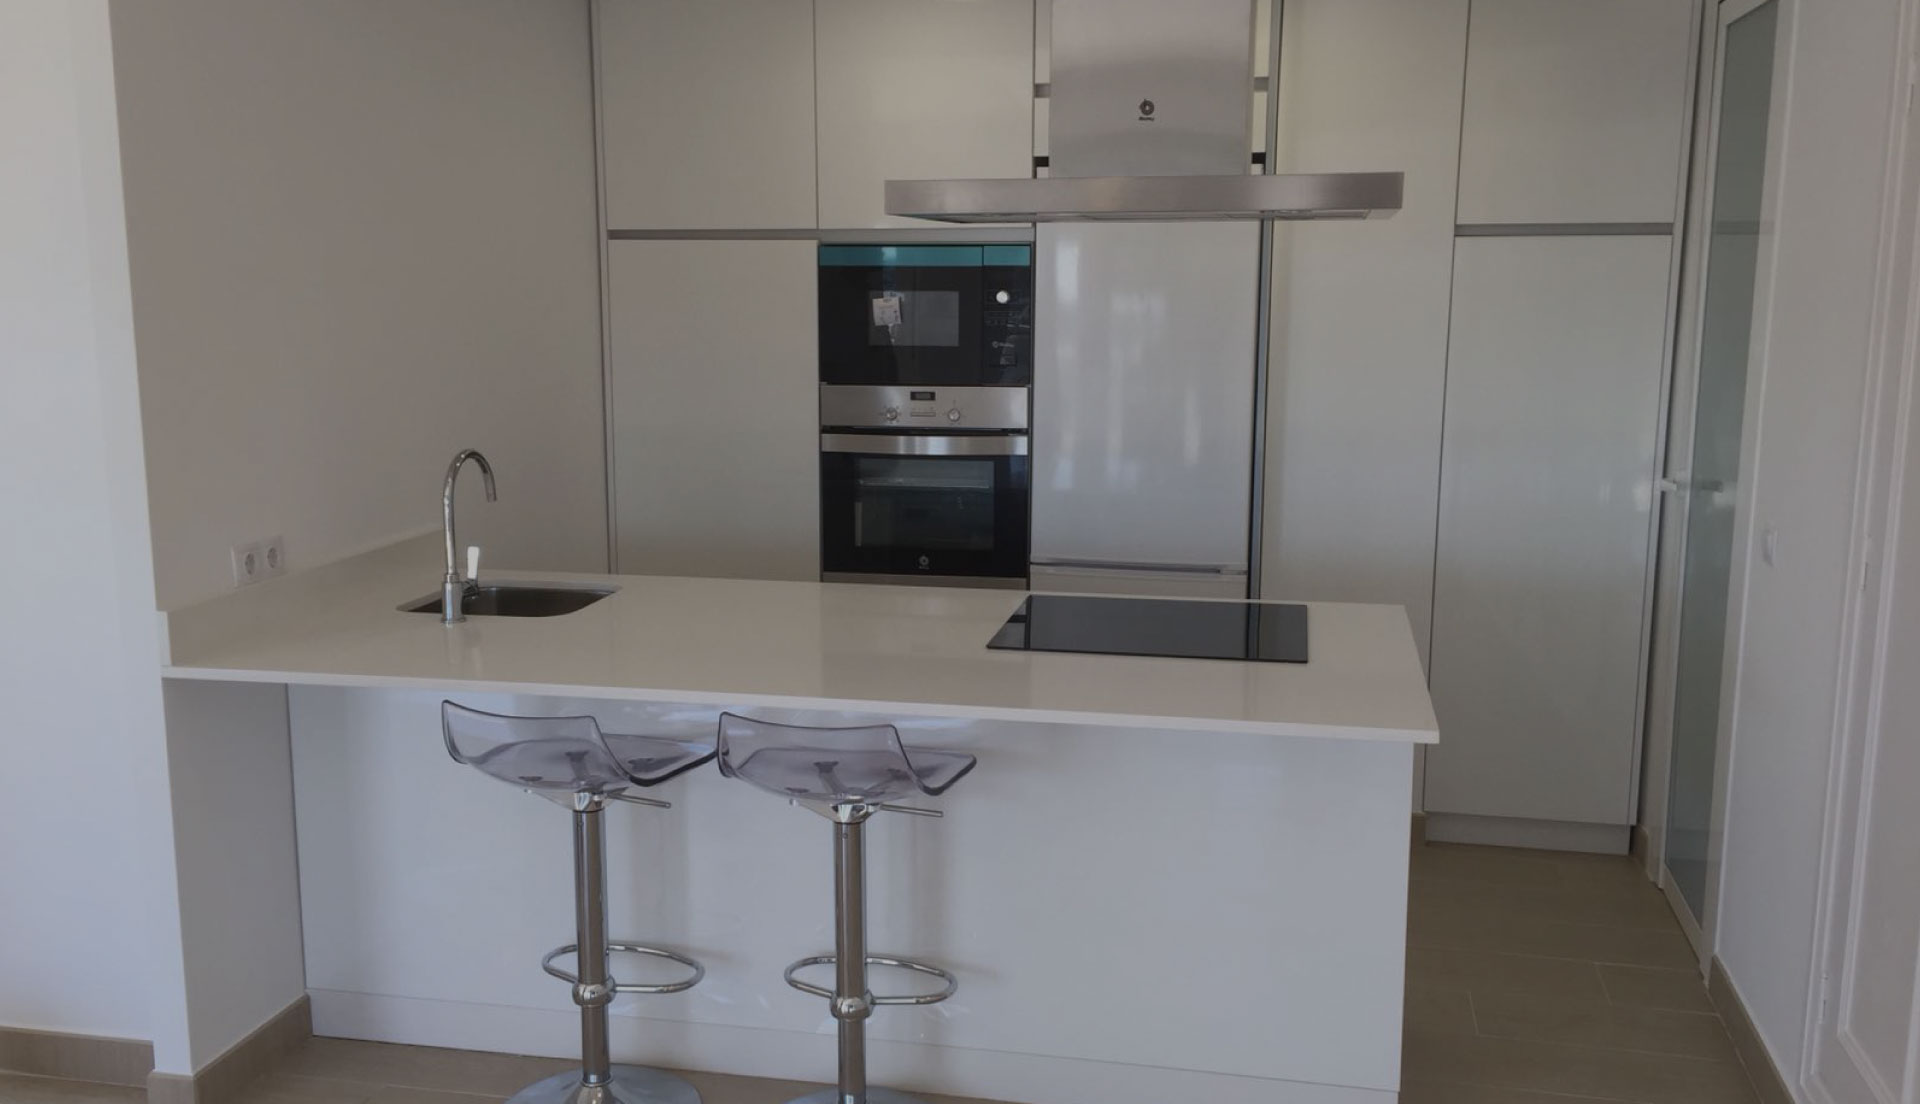 Reforma cocina sevilla 42 mq reformas sevilla for Cocinas sevilla